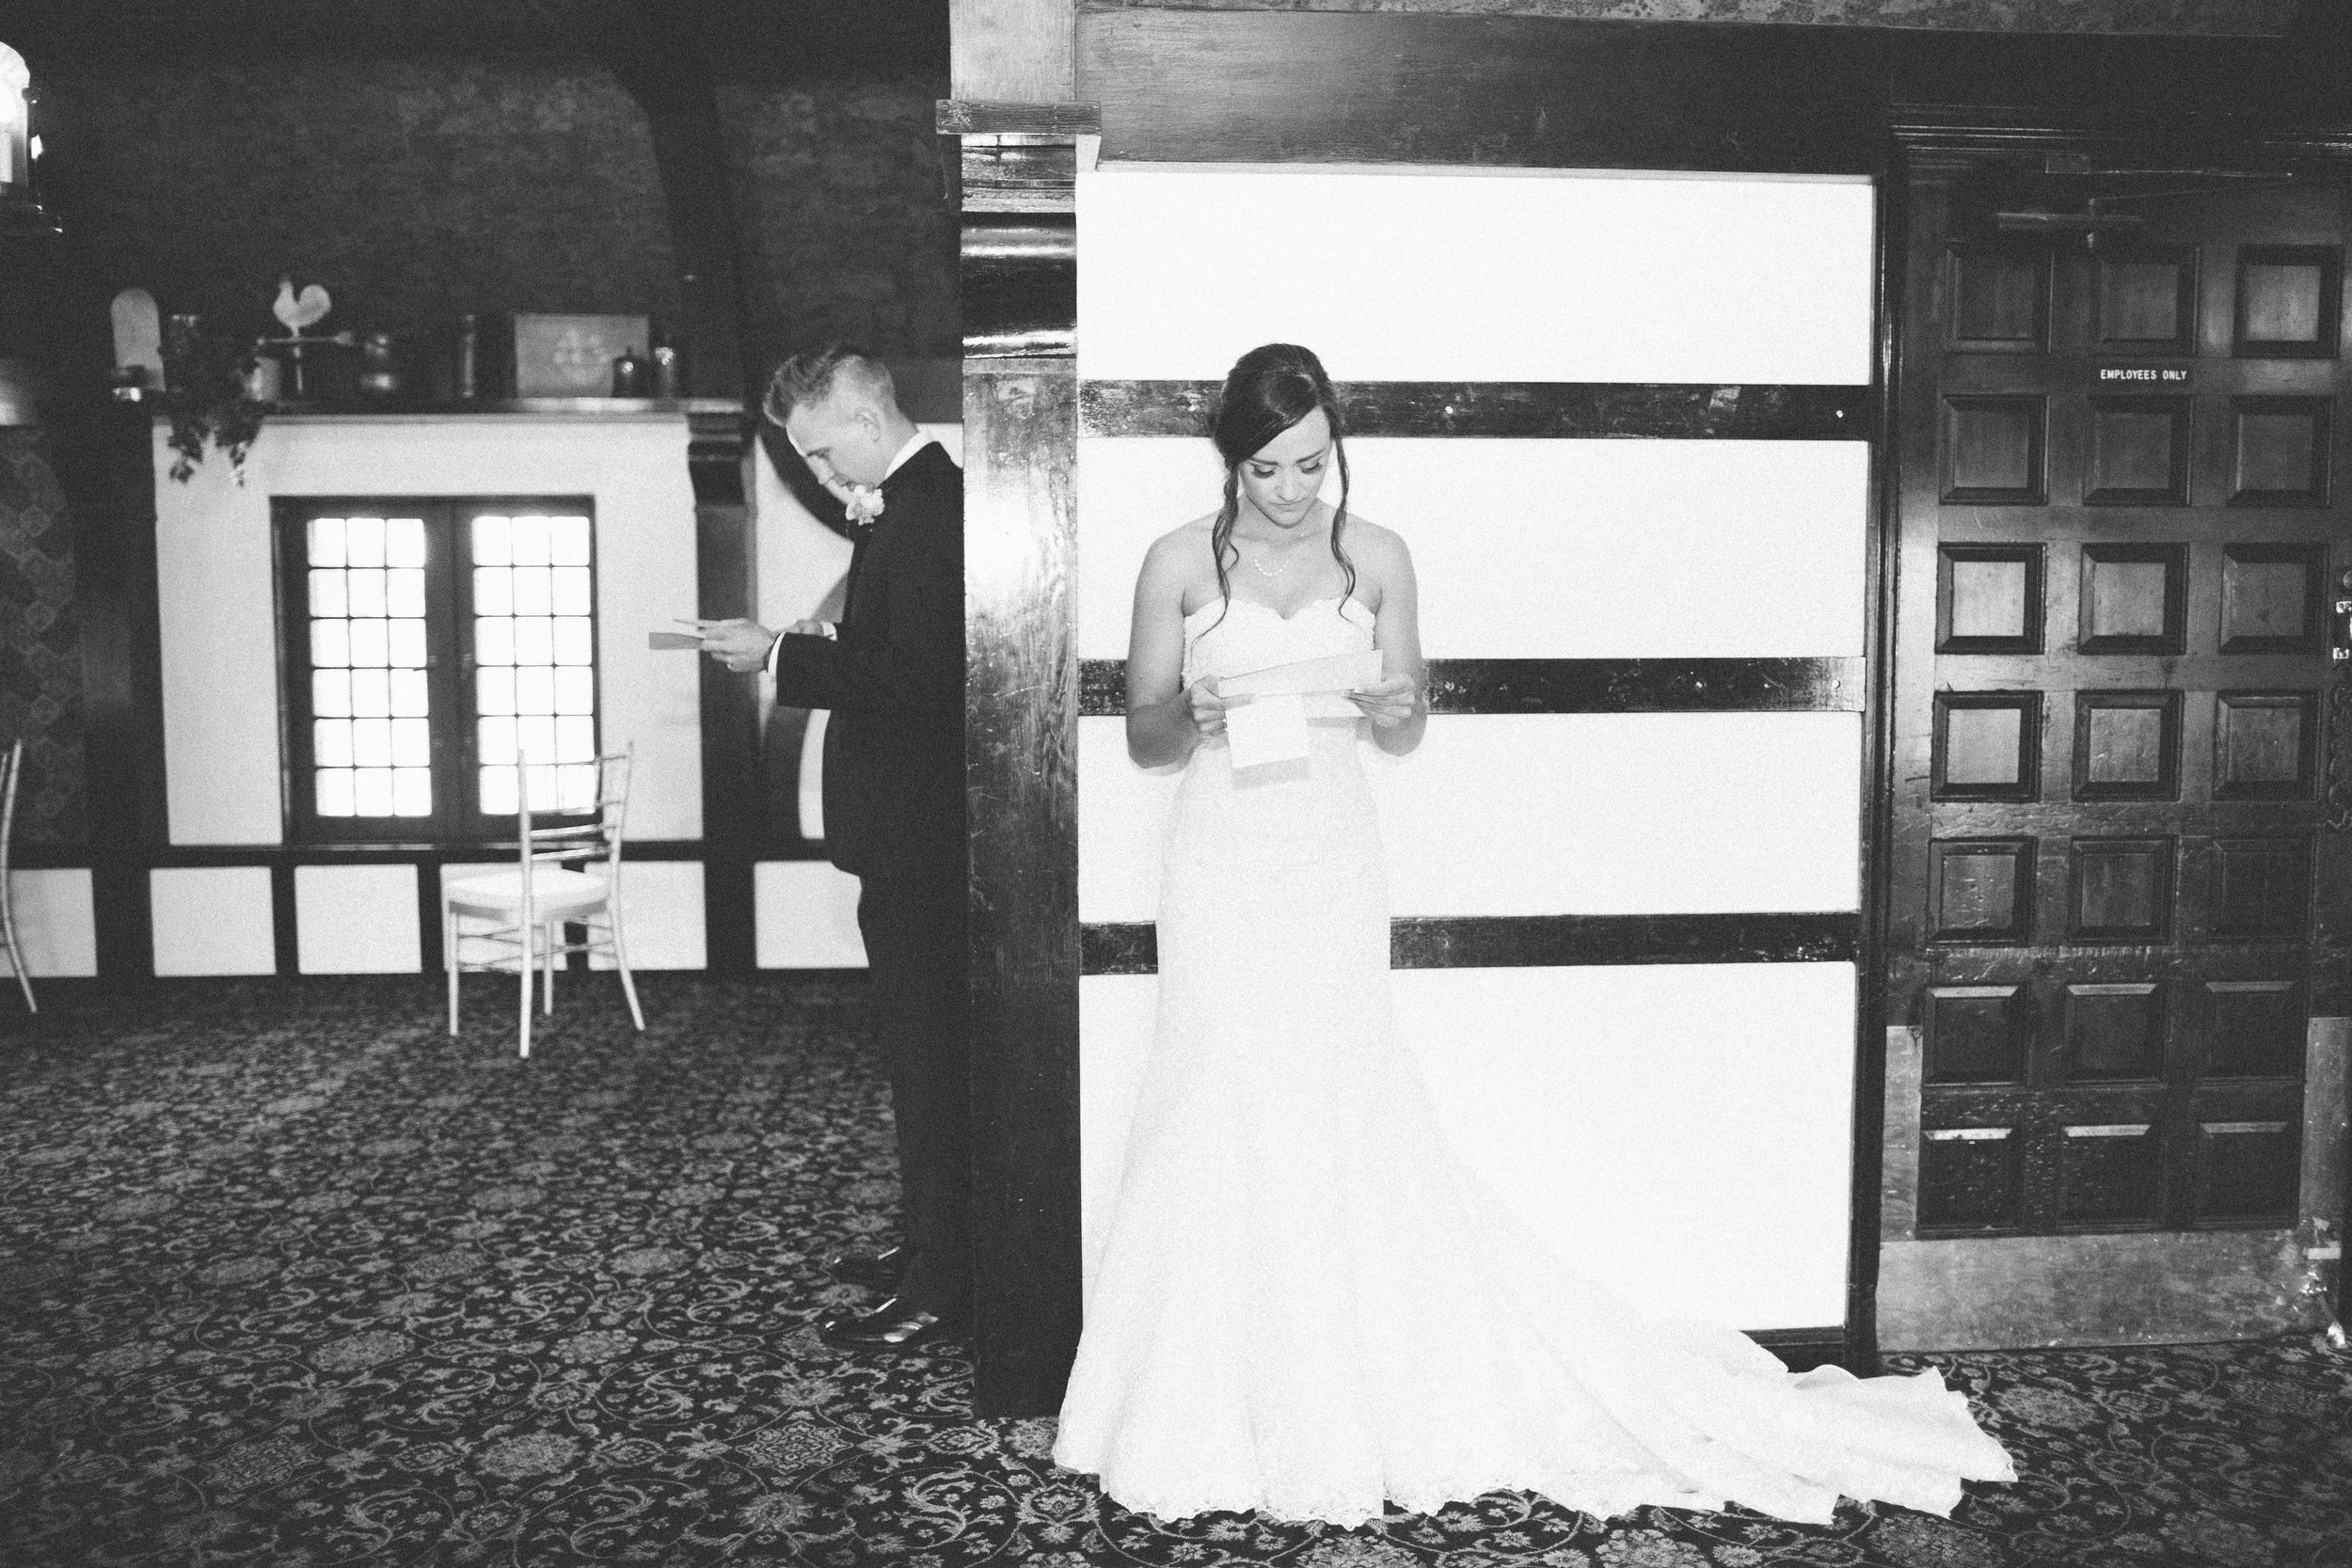 MP_16.06.12_Zach-&-Katlyn-Wedding-3227.jpg